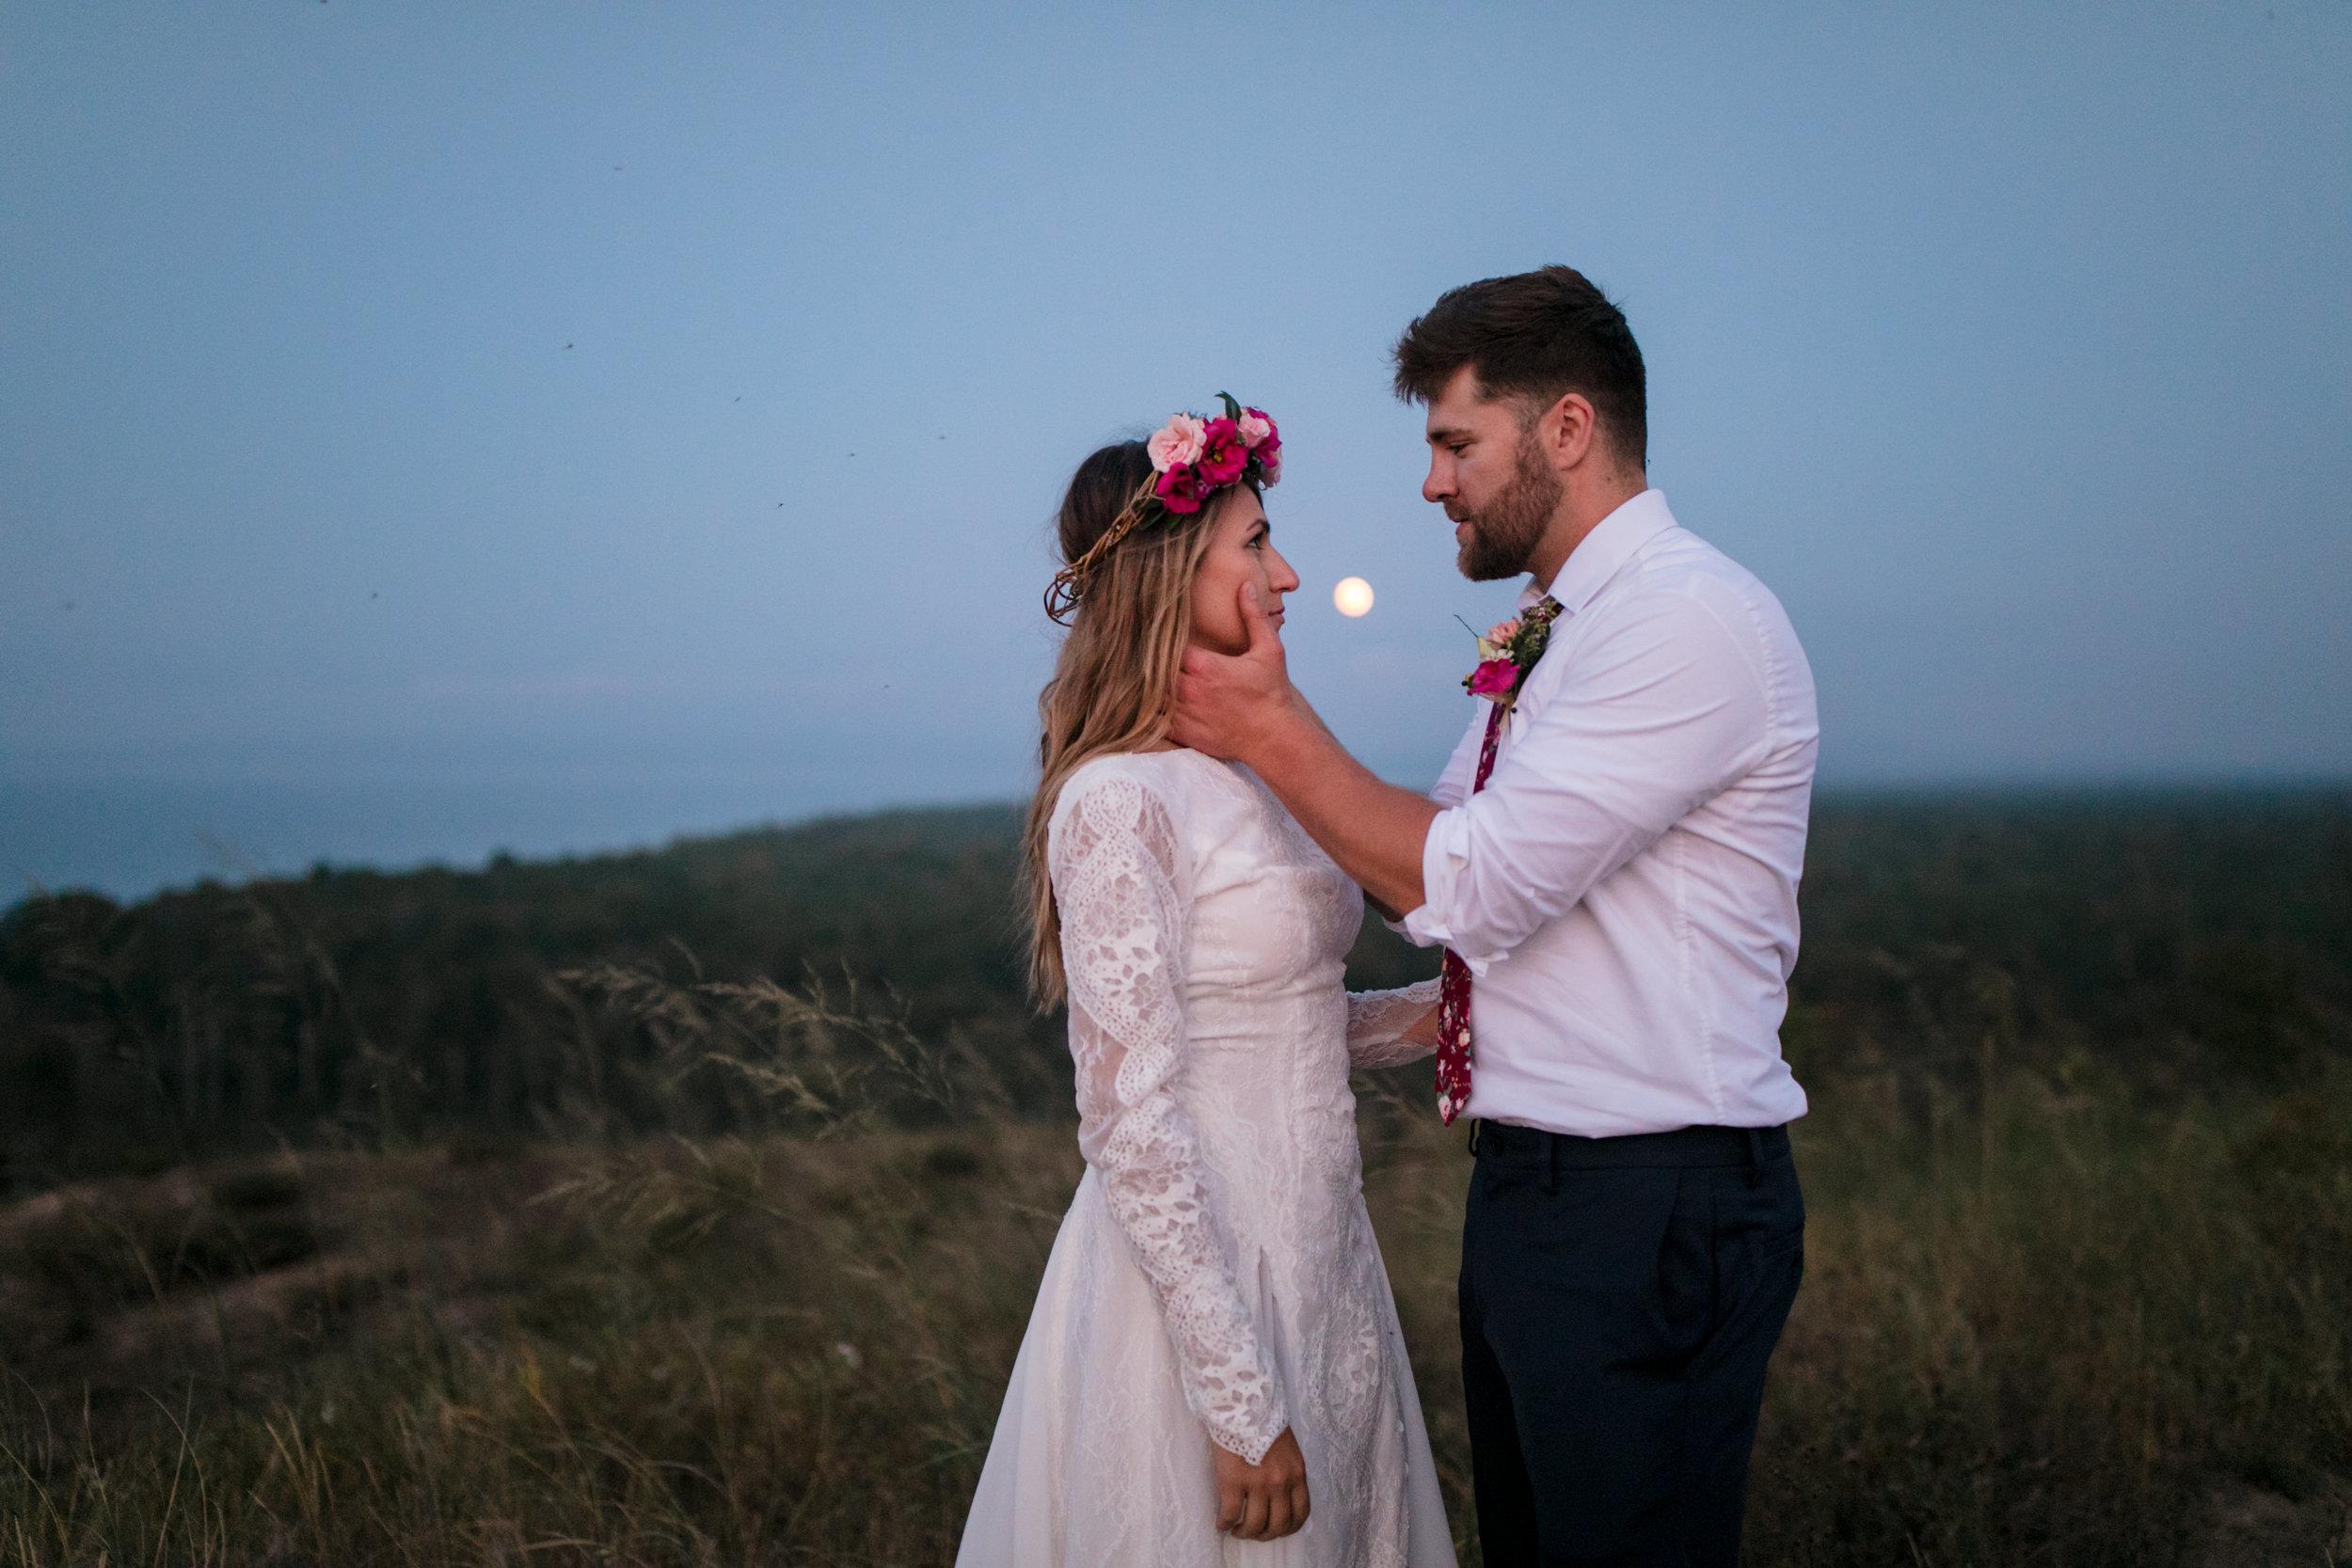 michigan-emotive-photographer-moonlight-elopement-mariha-hunter-235.jpg